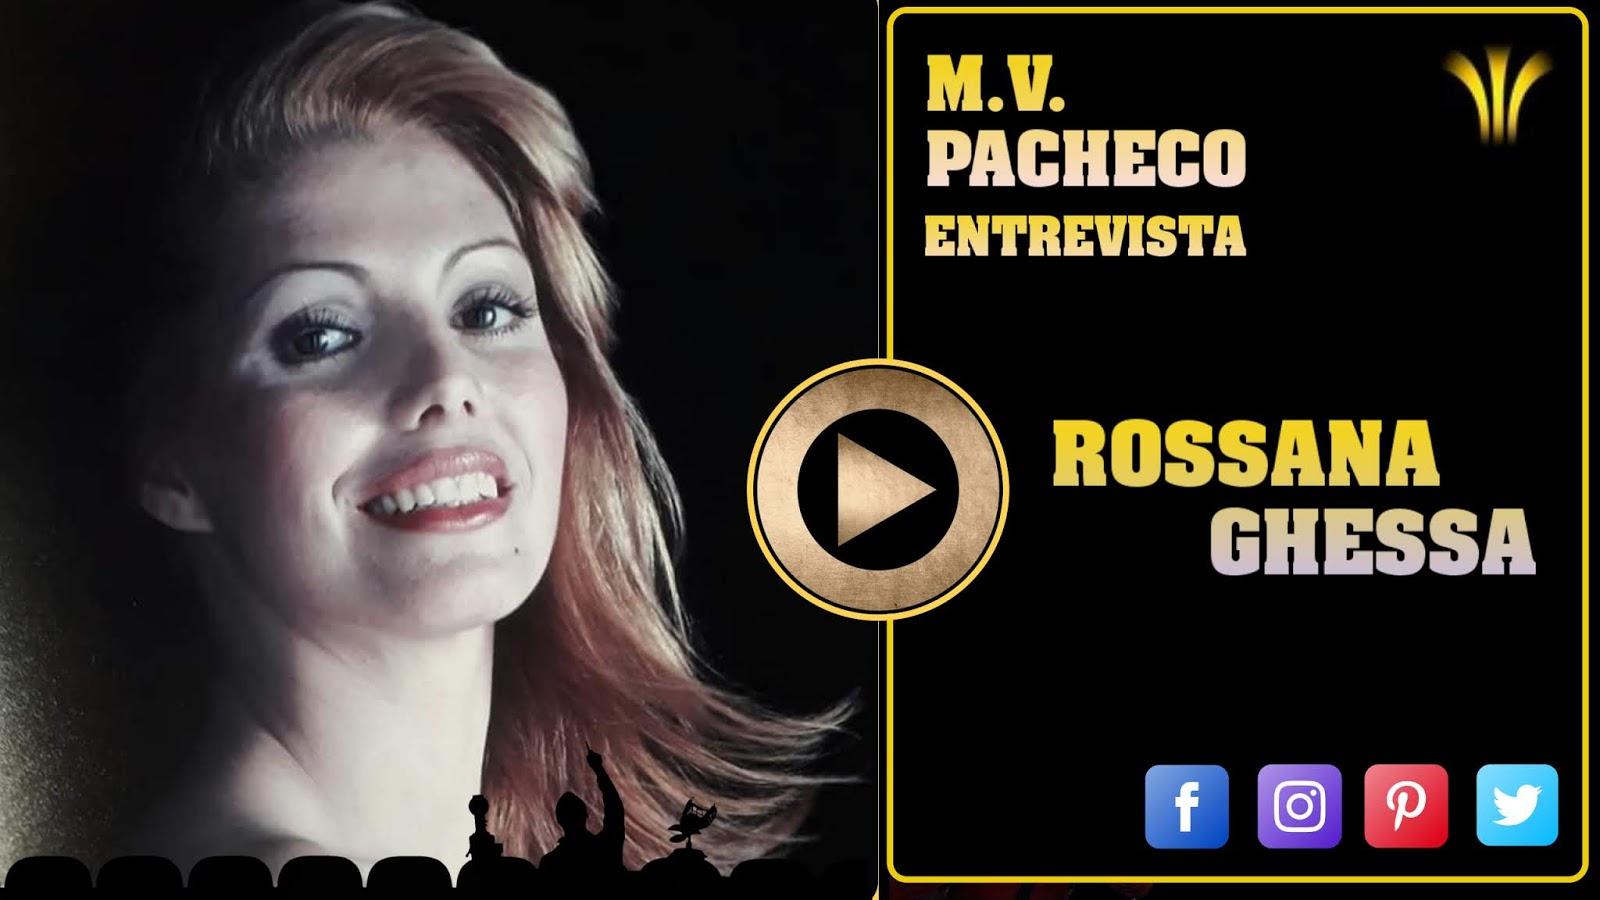 rossana-ghessa-entrevista